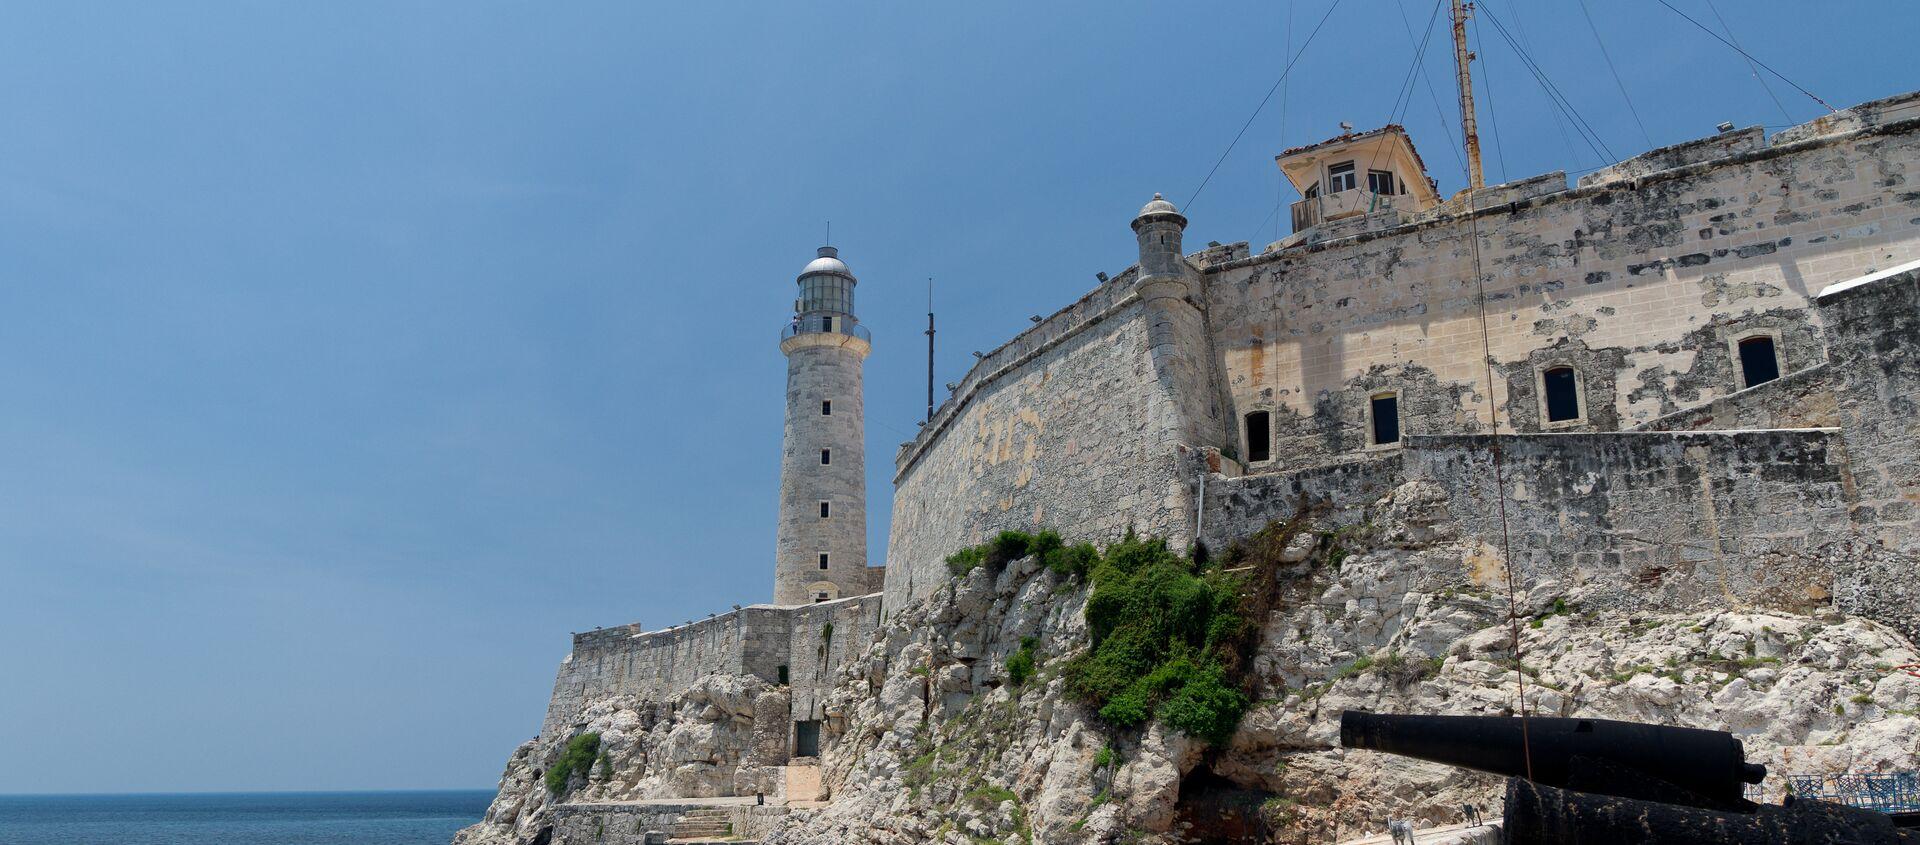 El castillo de los Tres Reyes del Morro, La Habana, Cuba - Sputnik Mundo, 1920, 15.01.2020